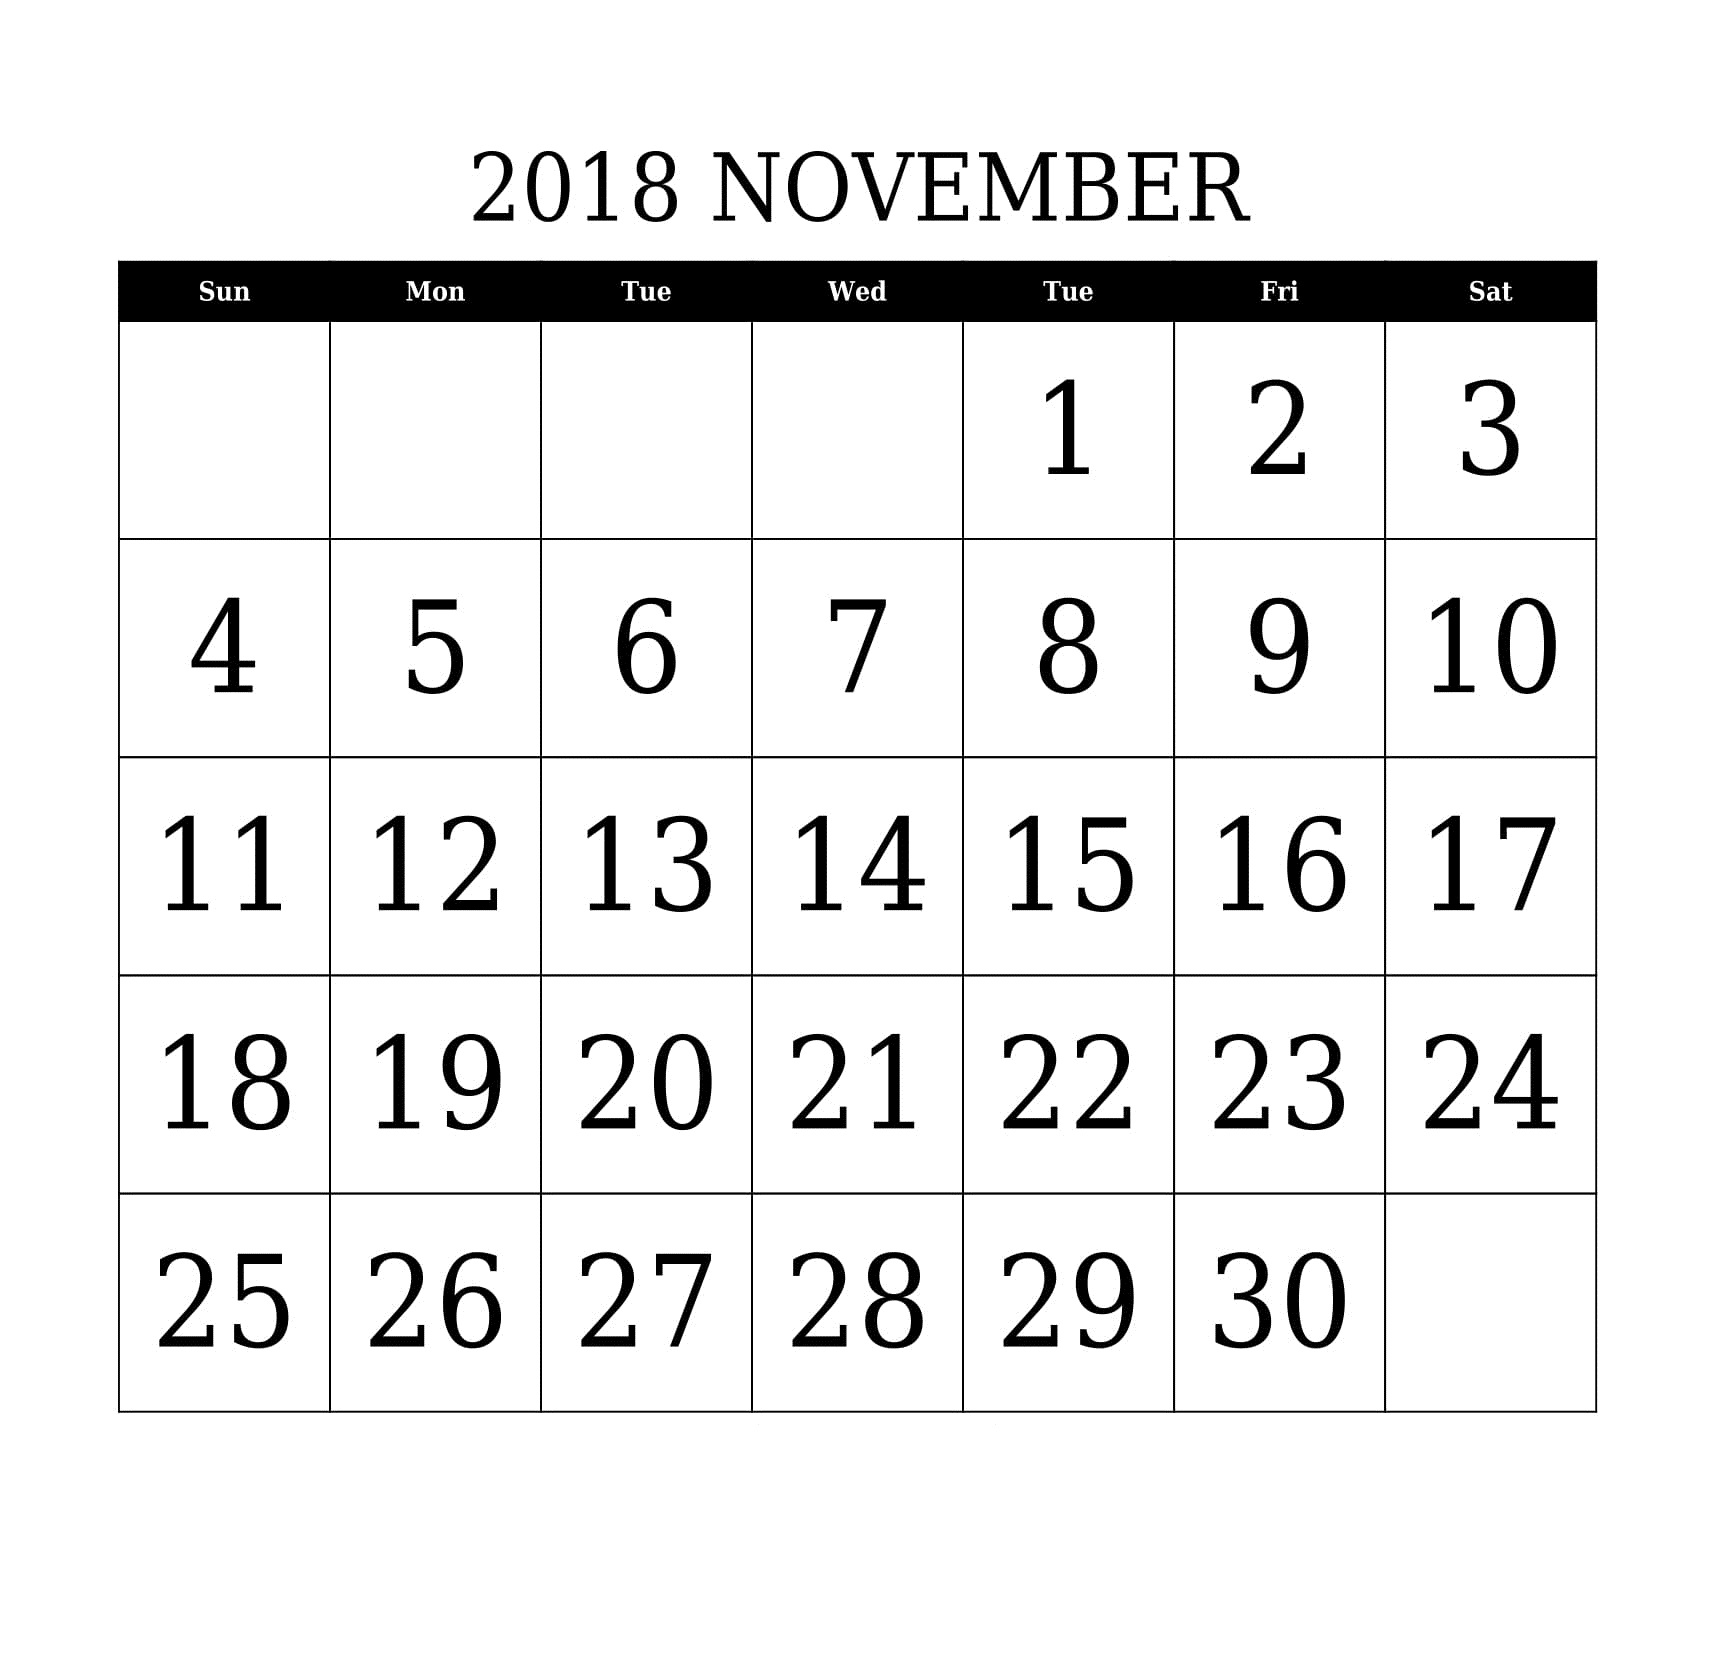 2018 November Calendar Template